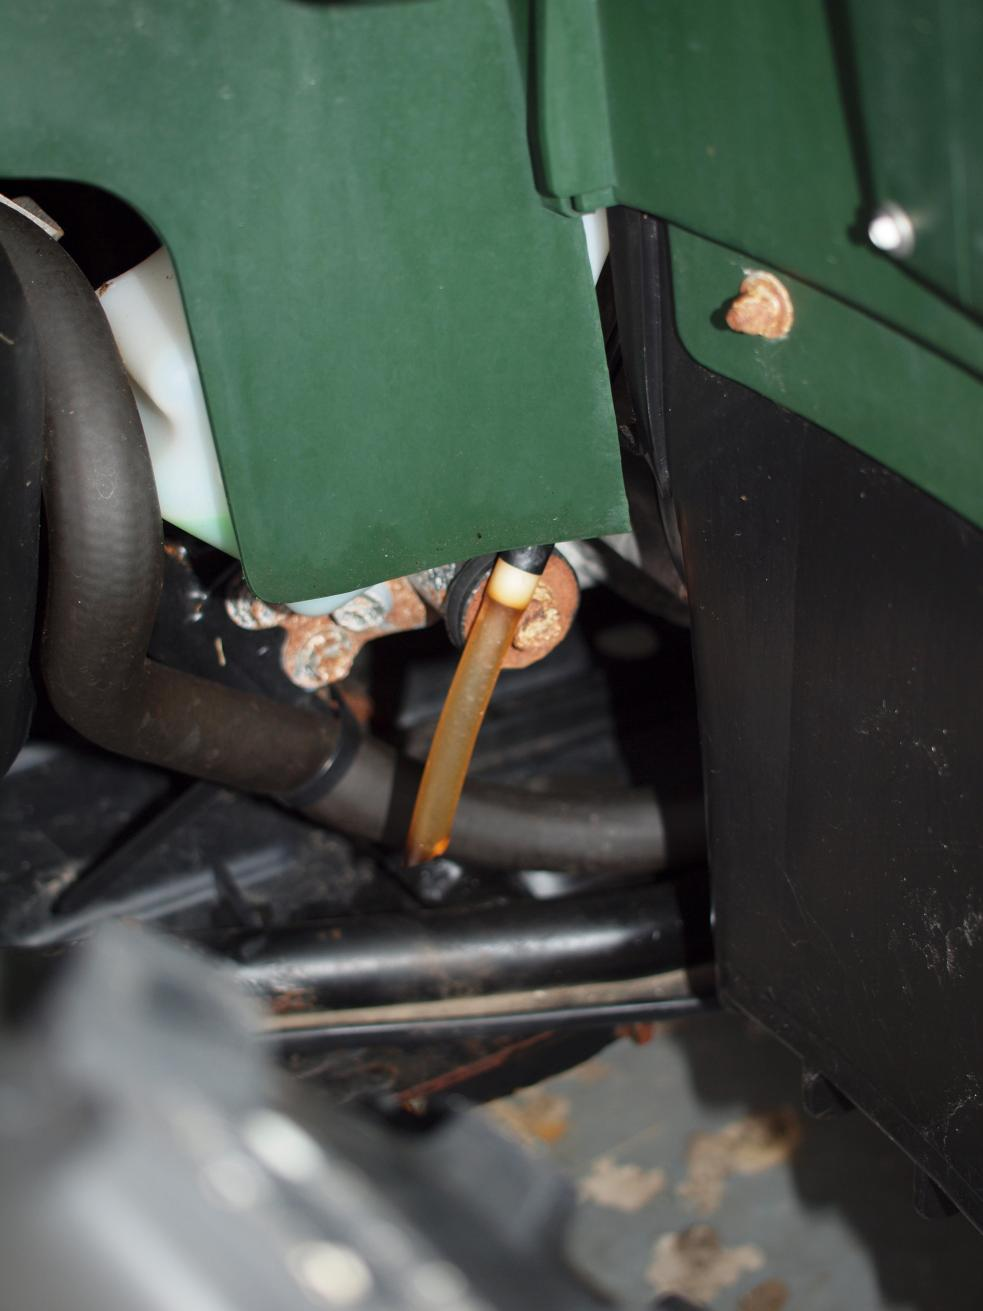 2003 Kodiak Leaking fuel from drain hose at bottom of carb - Yamaha